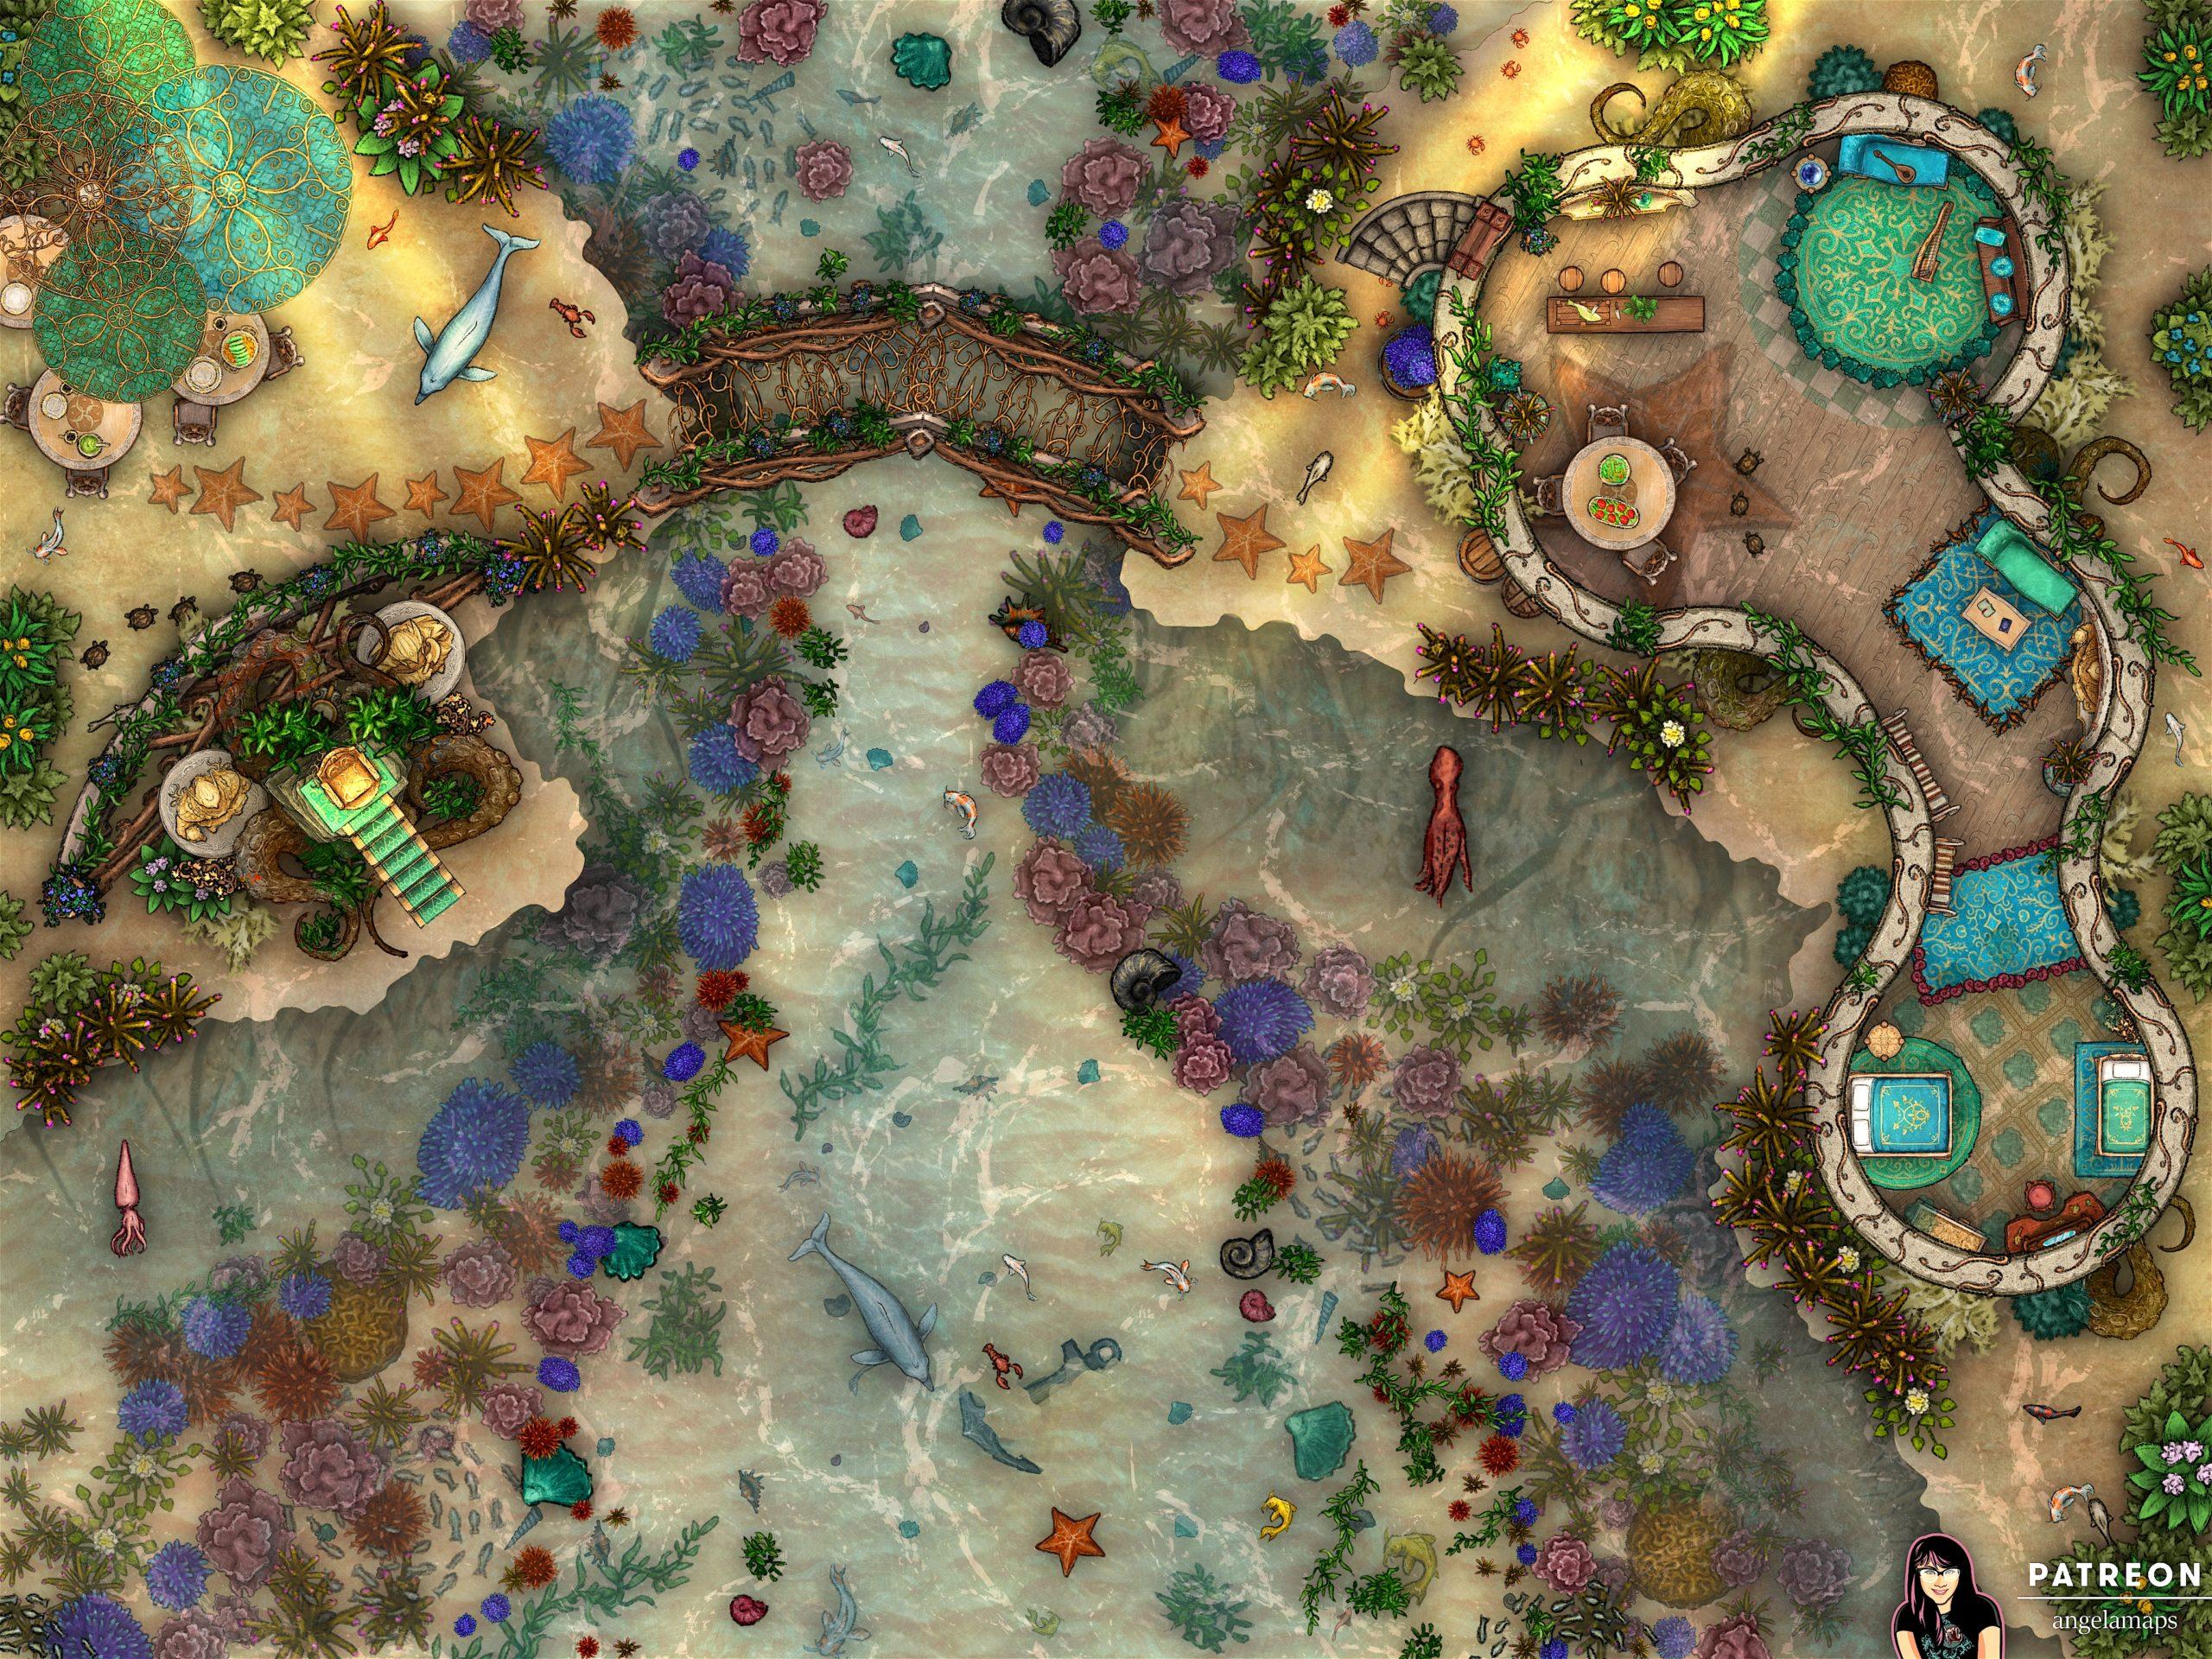 Sea elves aquatic elf battle map for D&D or pathfinder TTRPG